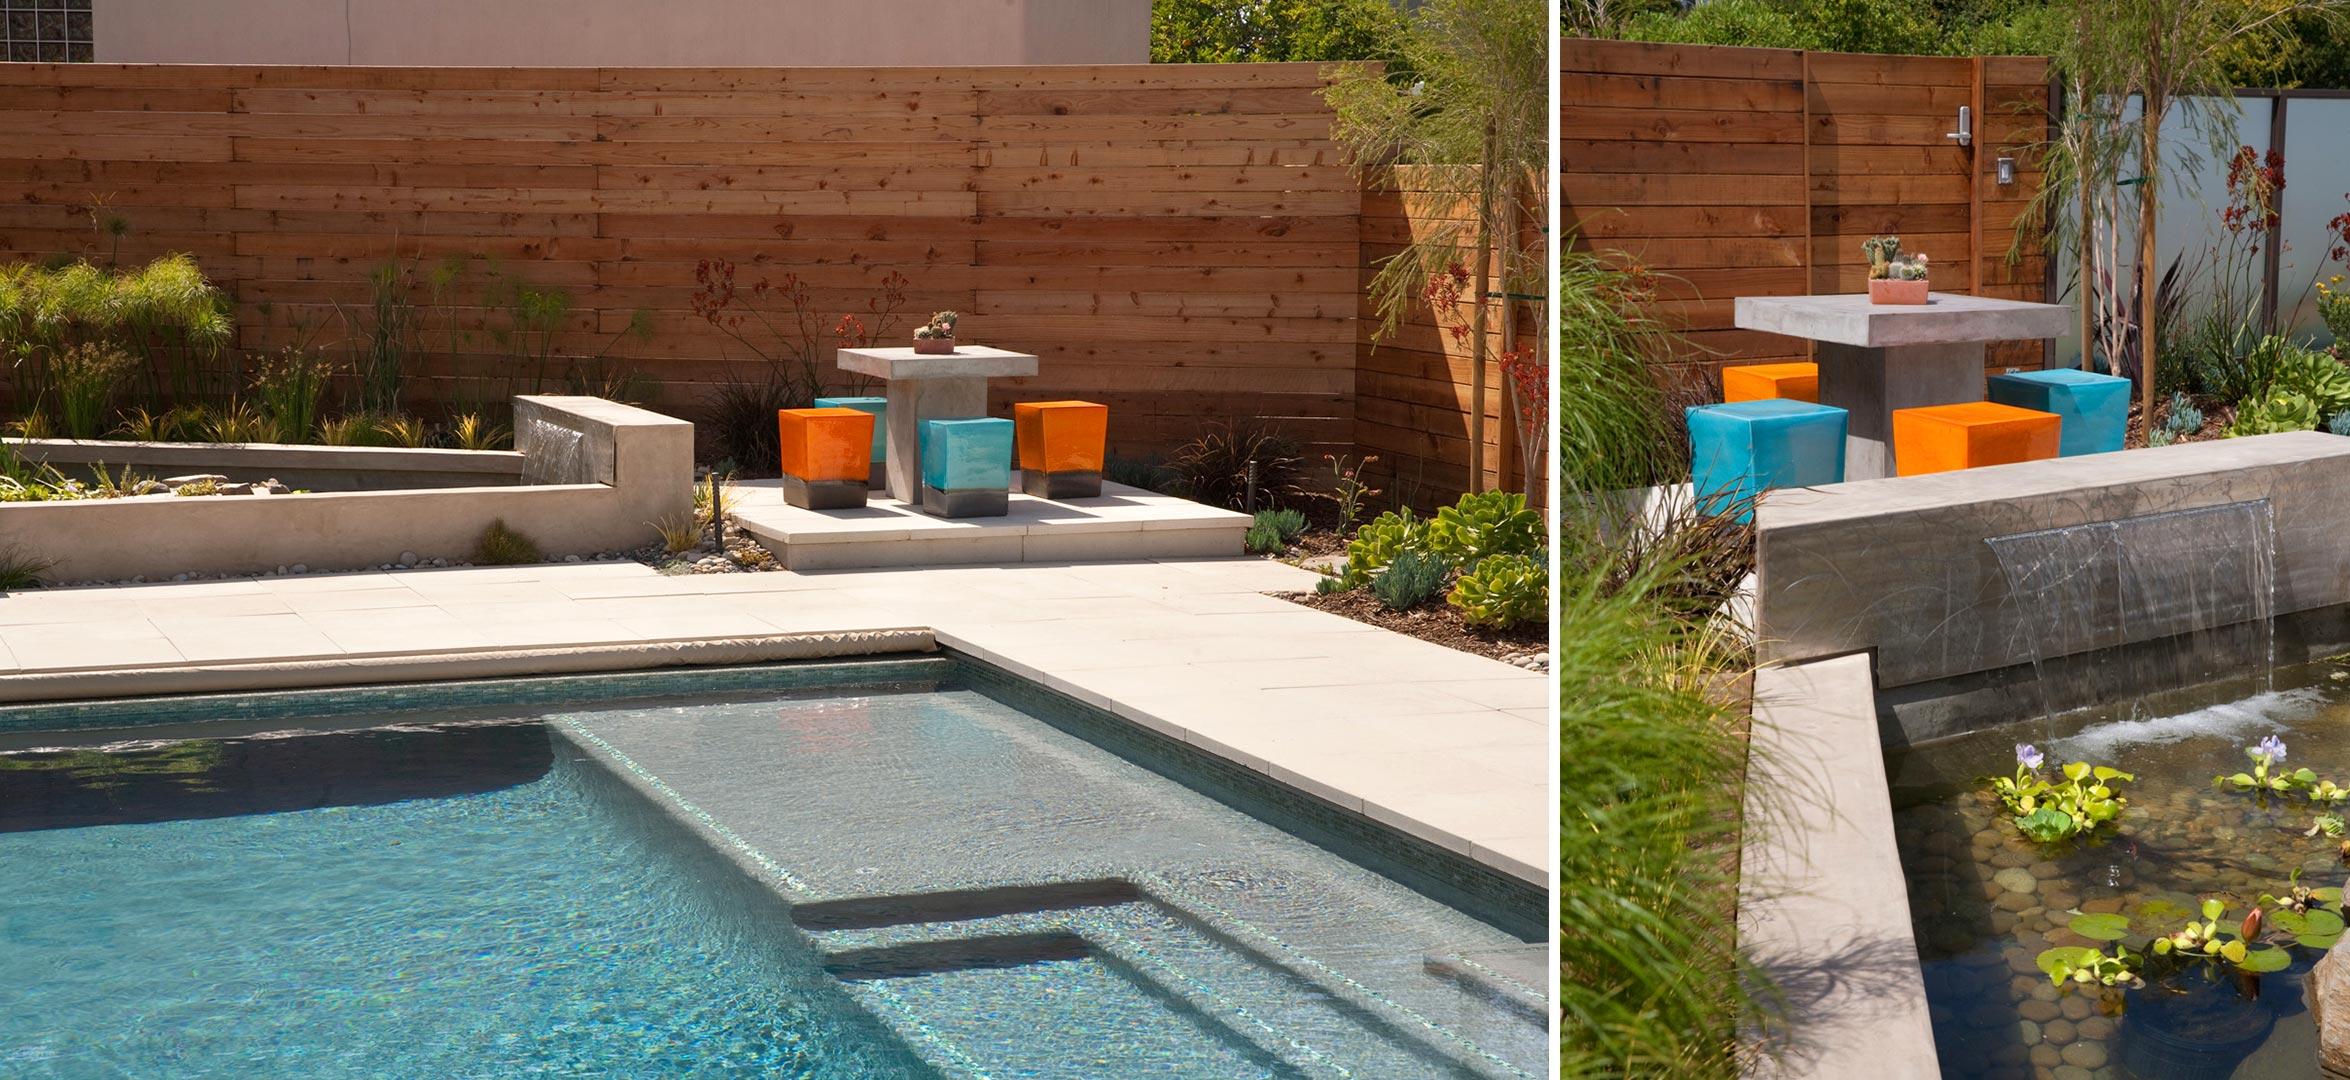 2-pool-colorful-concrete-furniture.jpg